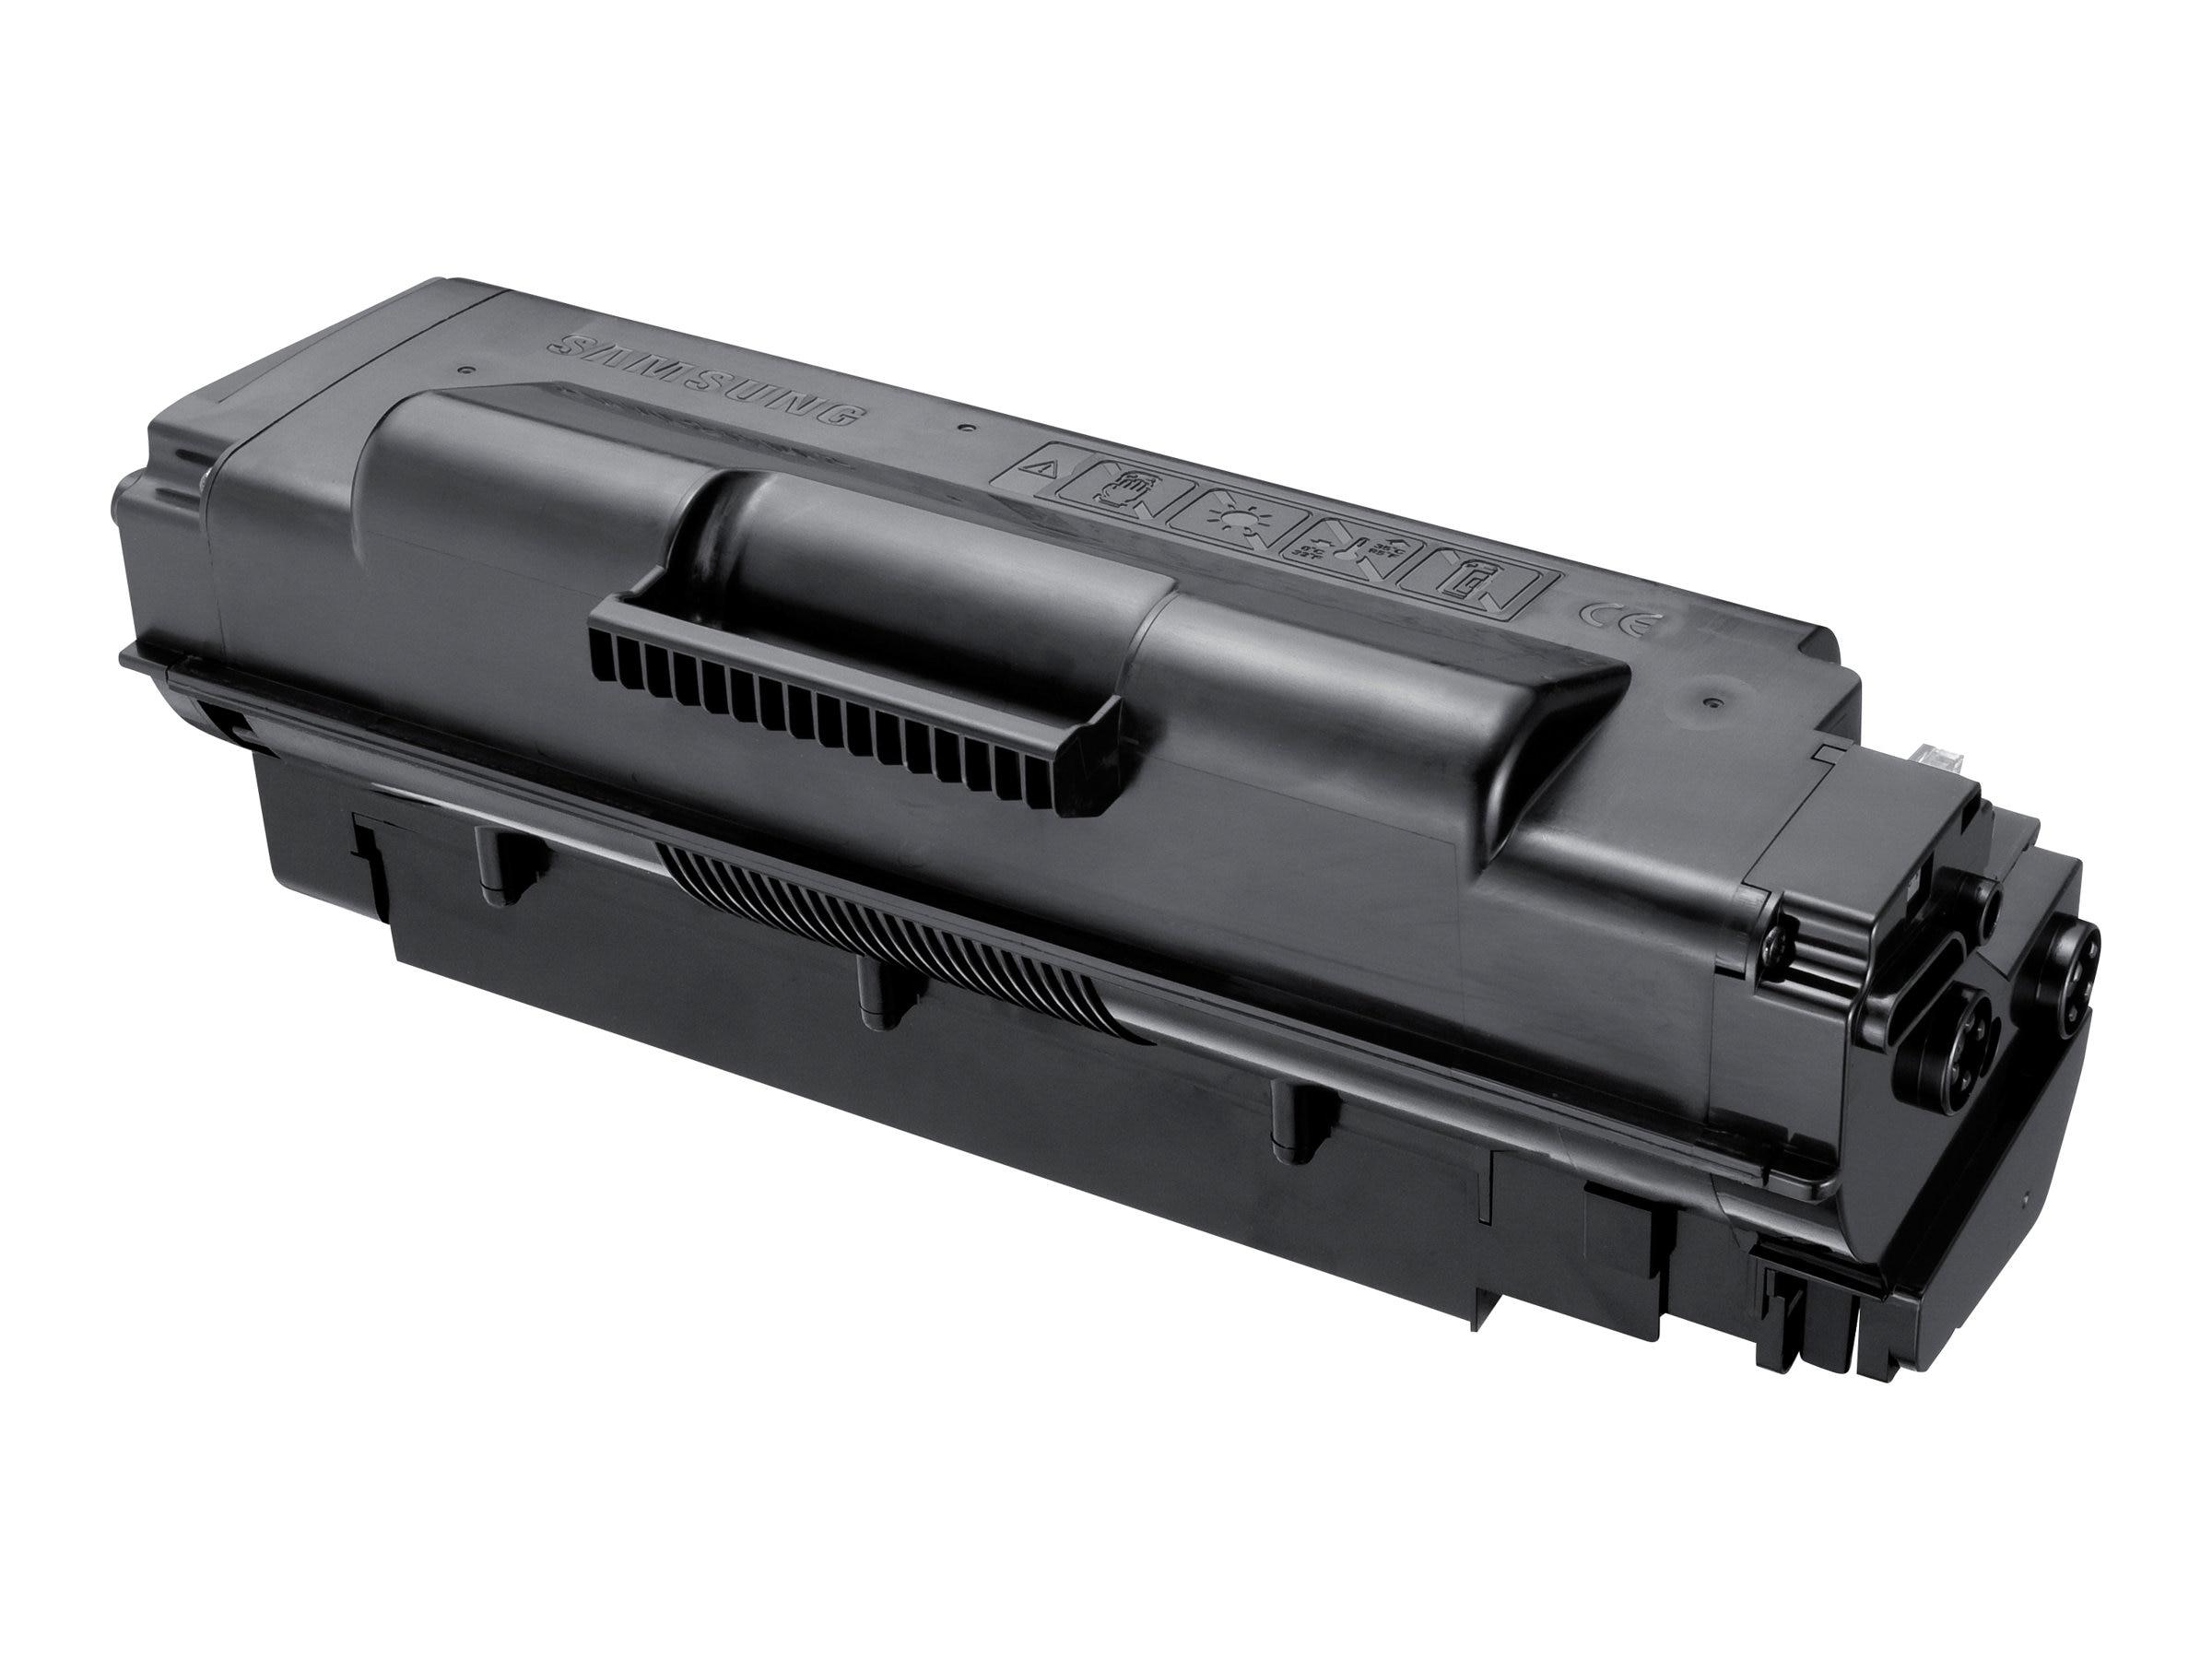 Samsung Black Extra High Yield Toner Cartridge for ML-4512ND, ML-5012ND & ML-5017ND